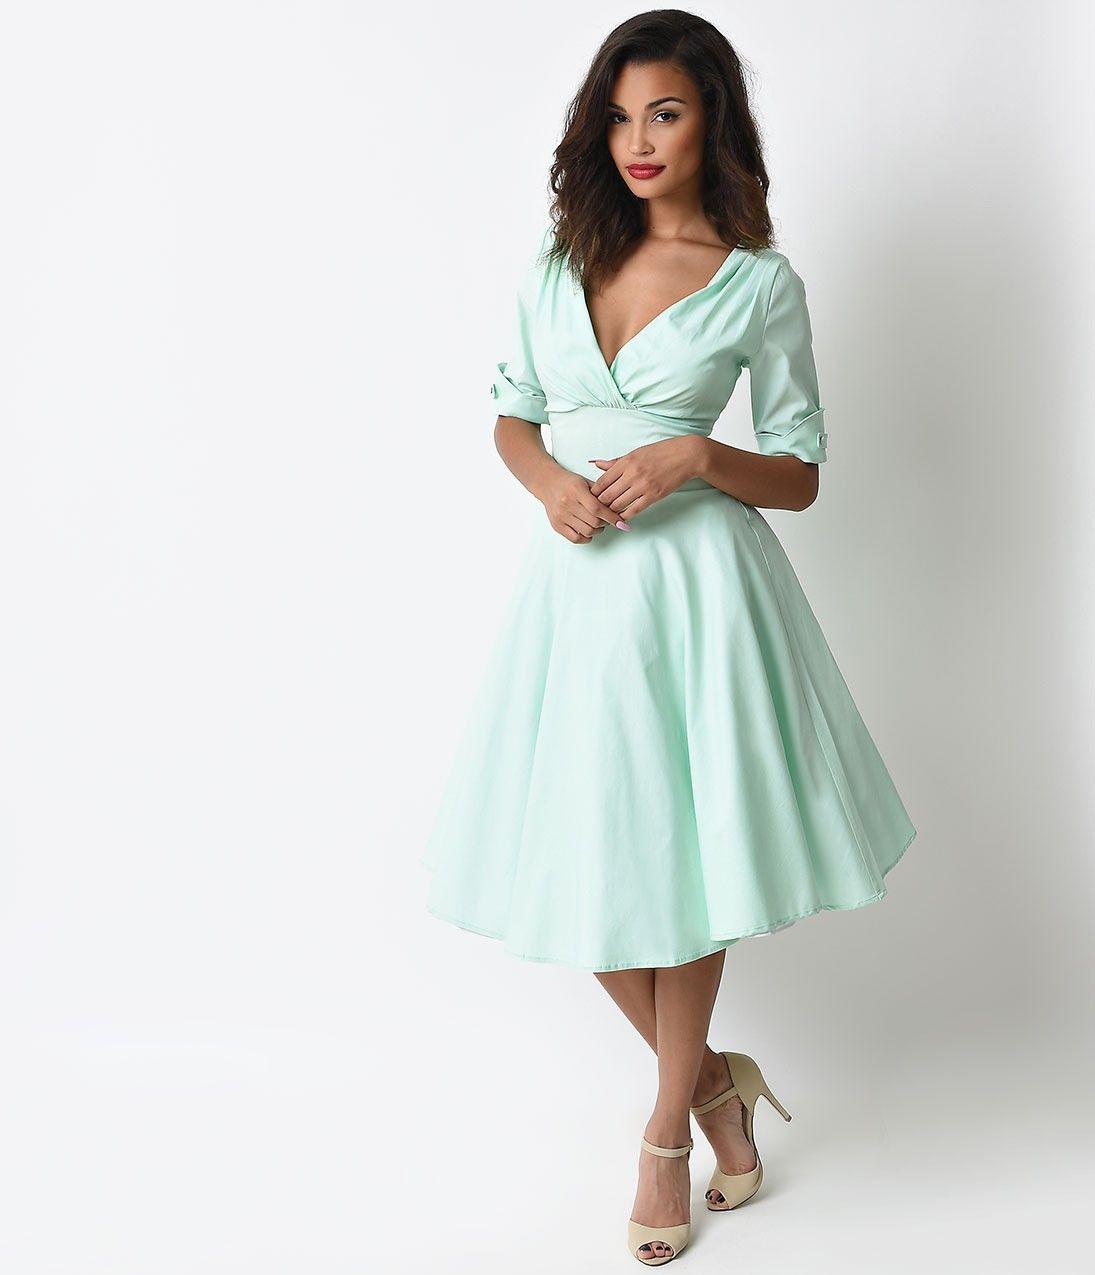 Cabaret Vintage - 1950s Style Mint Delores Sleeved Swing Dress ...